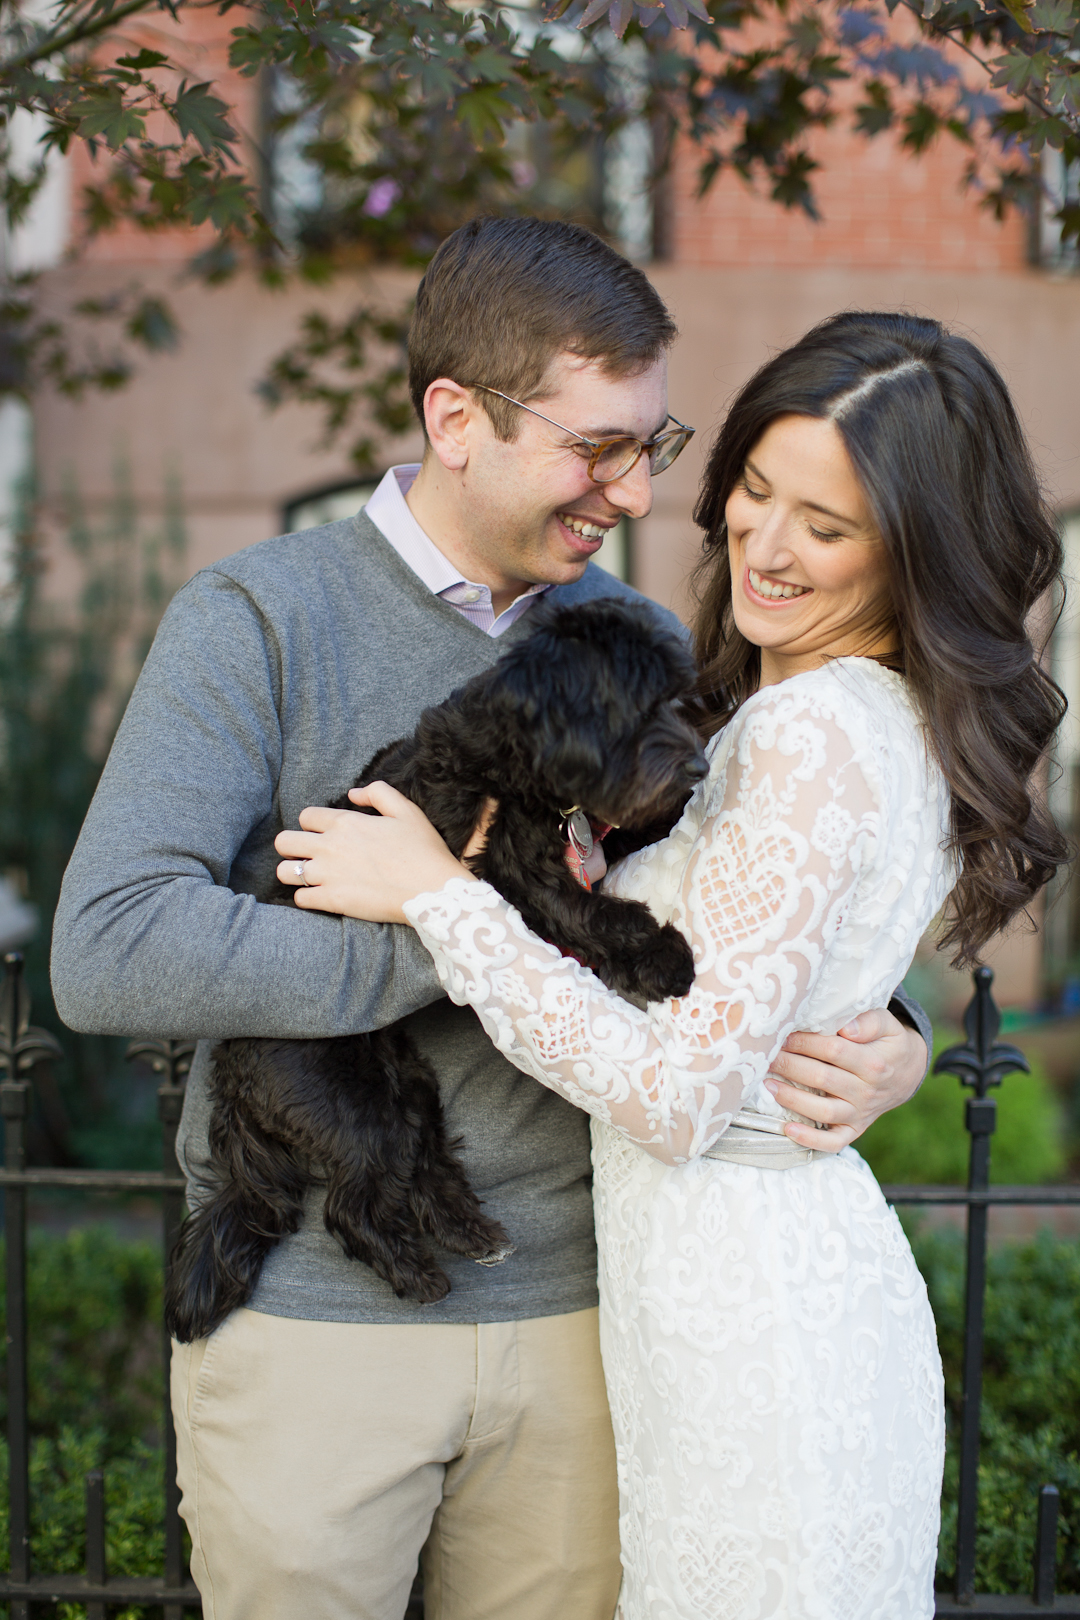 Melissa Kruse Photography - Christina & Alex Kips Bay Engagement Photos-15.jpg